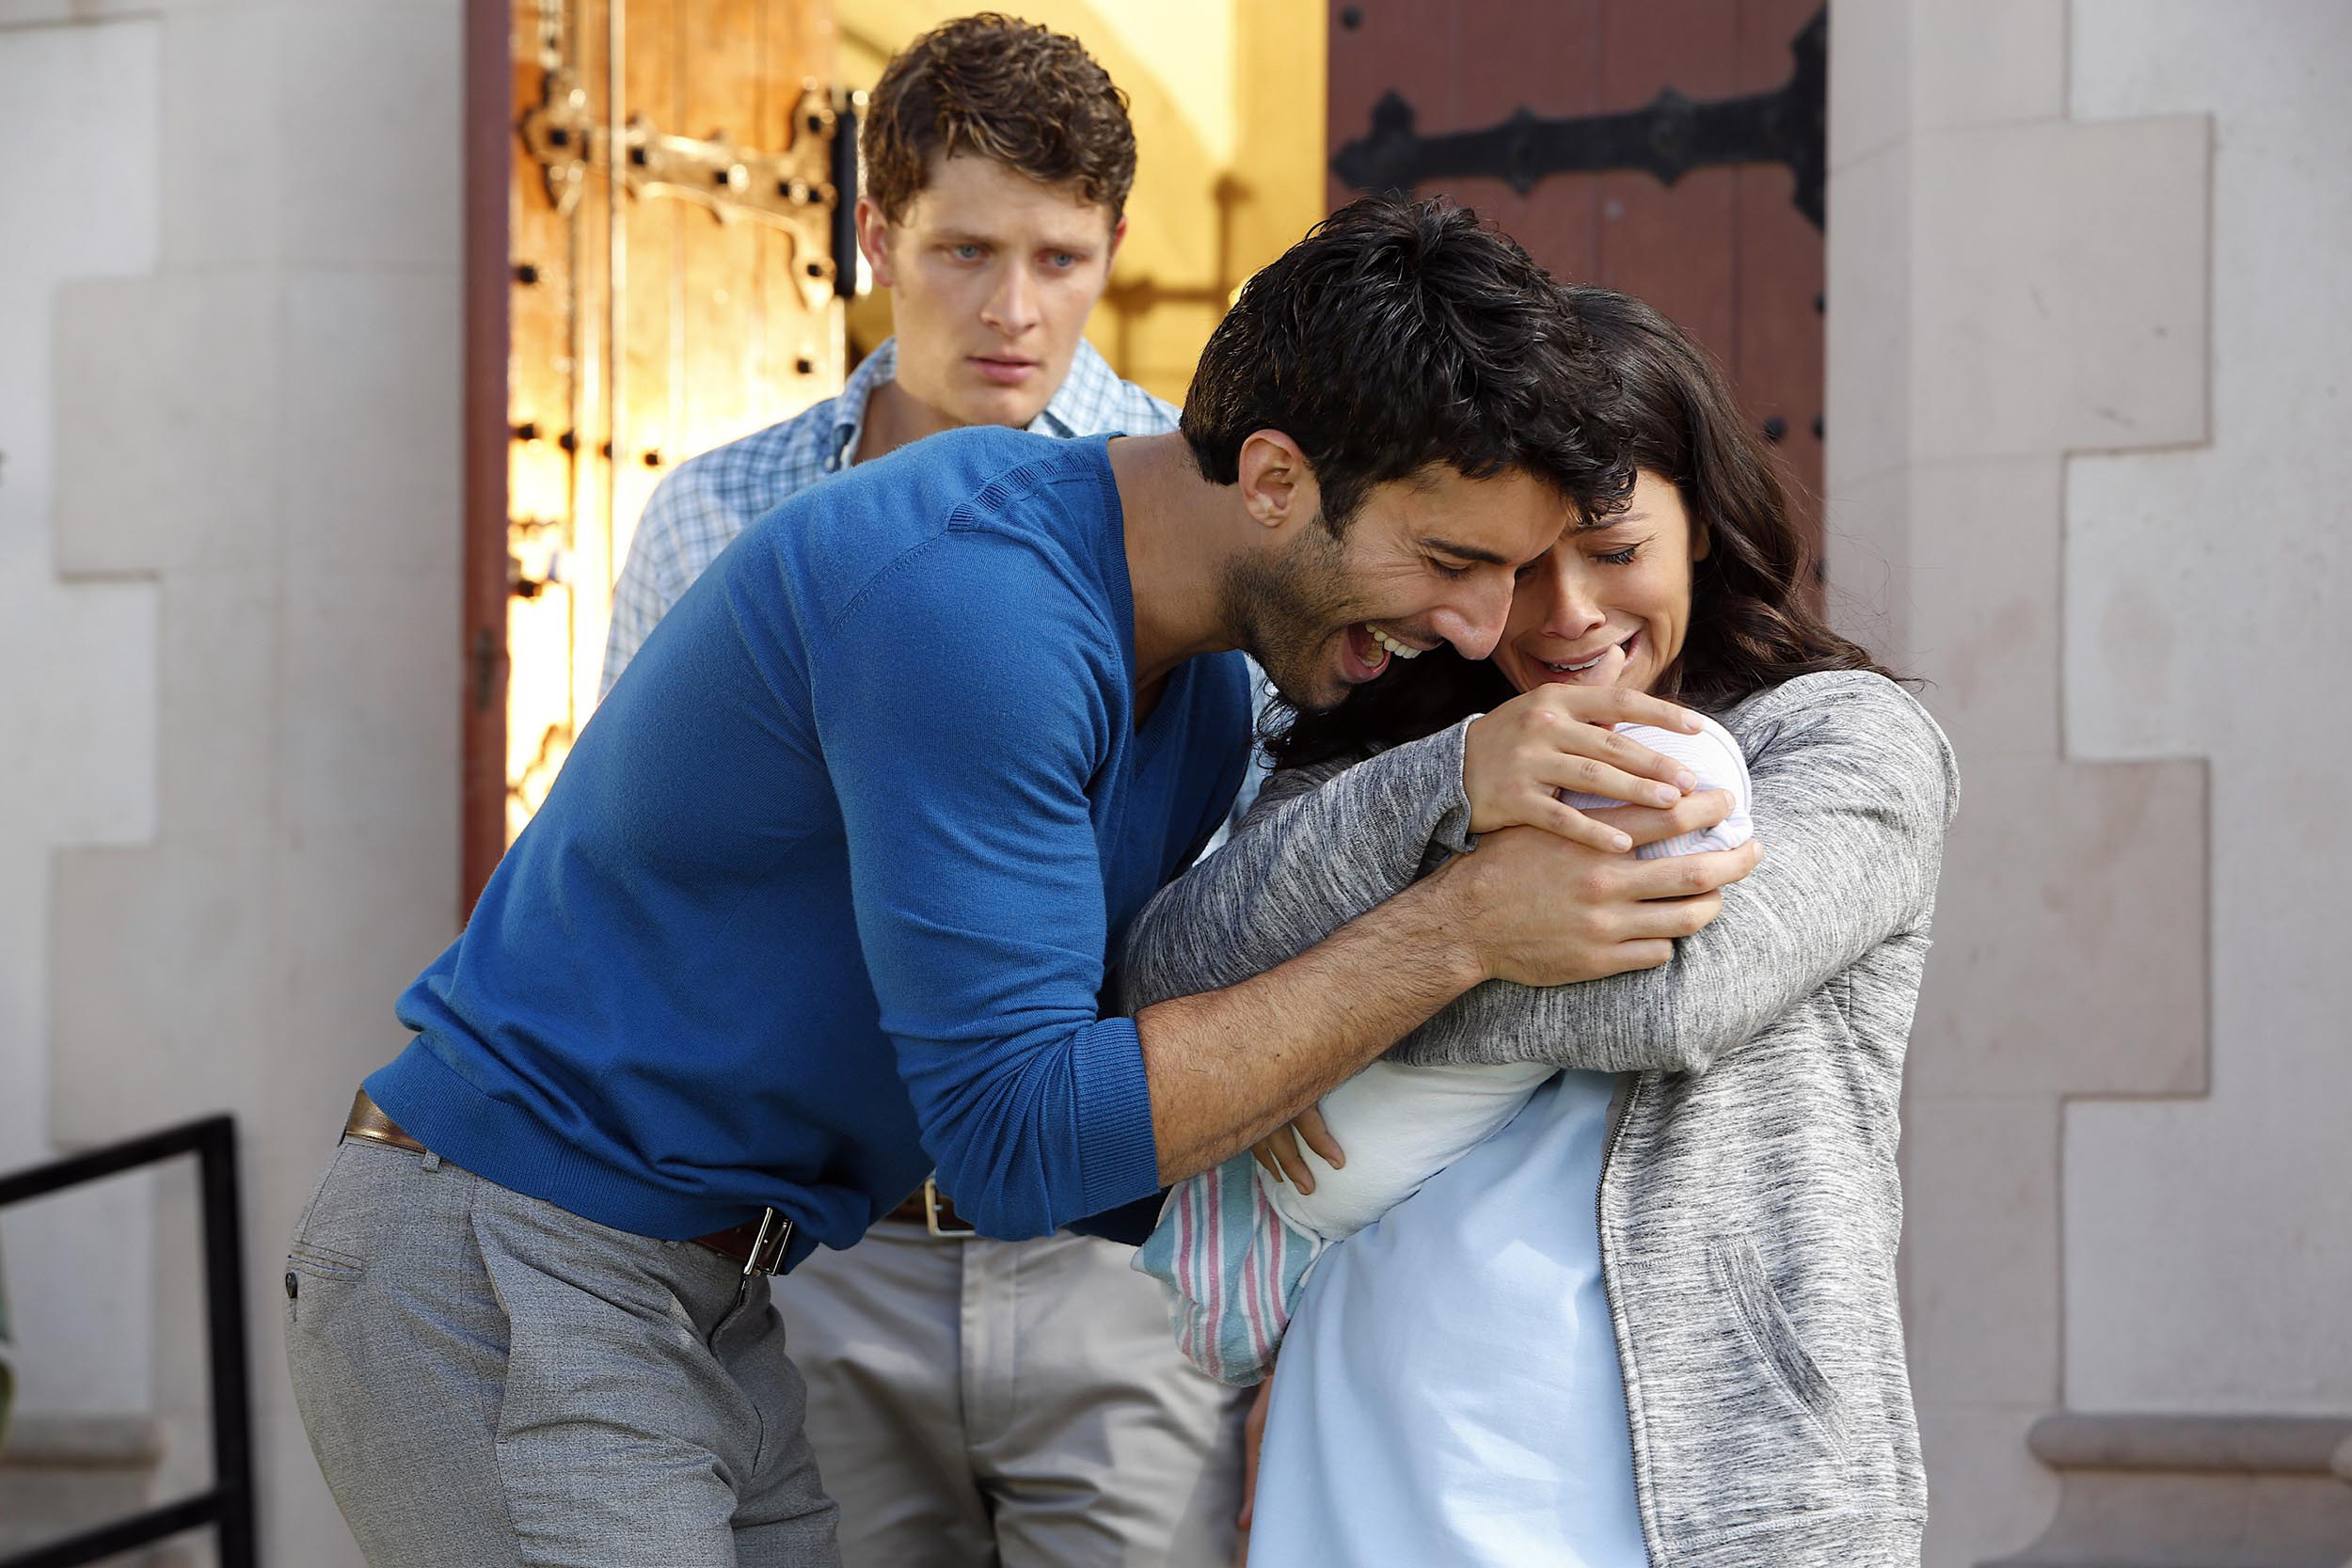 jane, michael, and rafael hugging baby